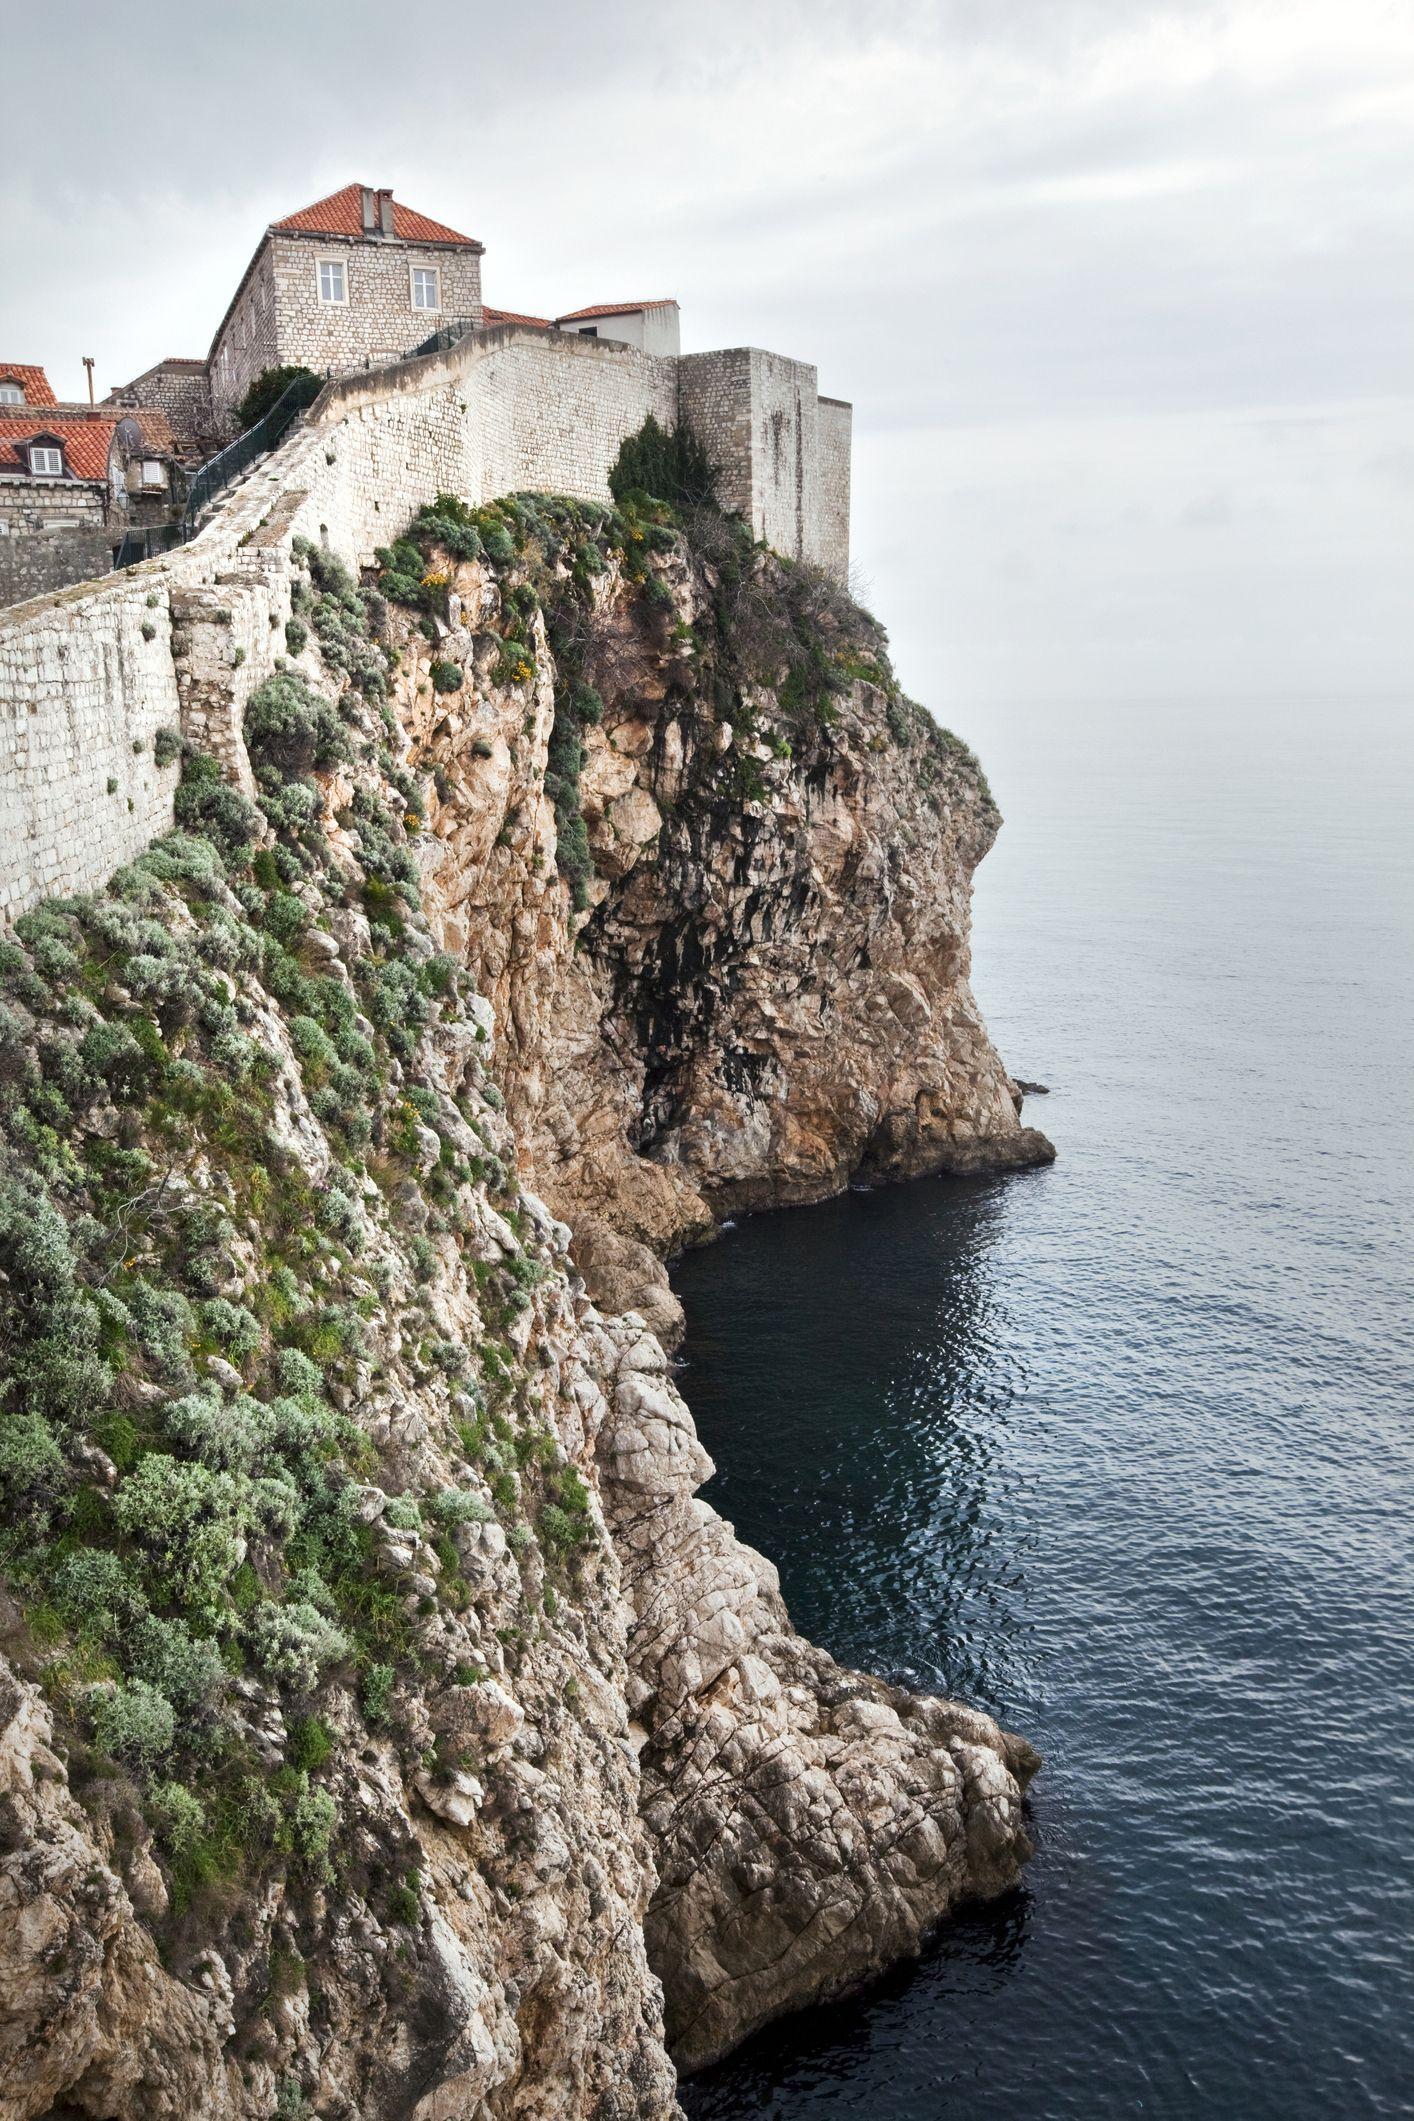 Things to do in Croatia